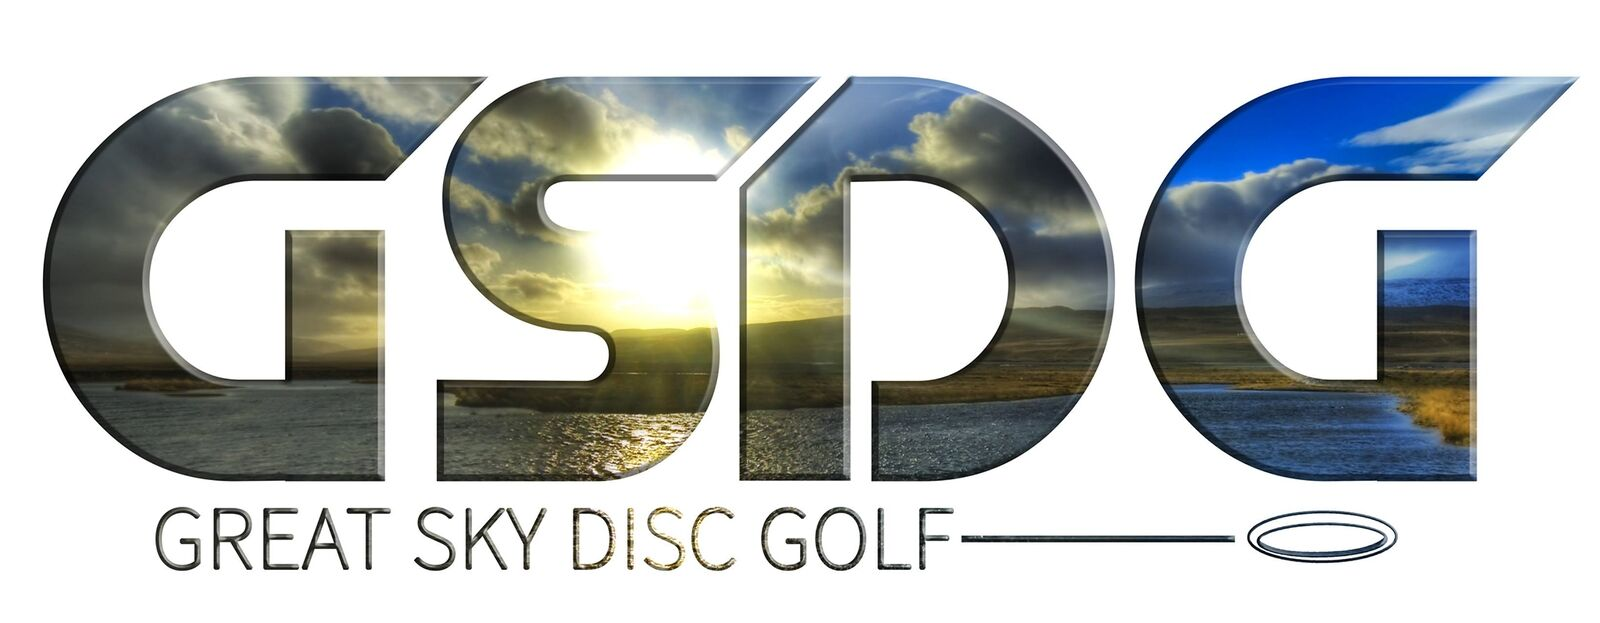 Great Sky Disc Golf